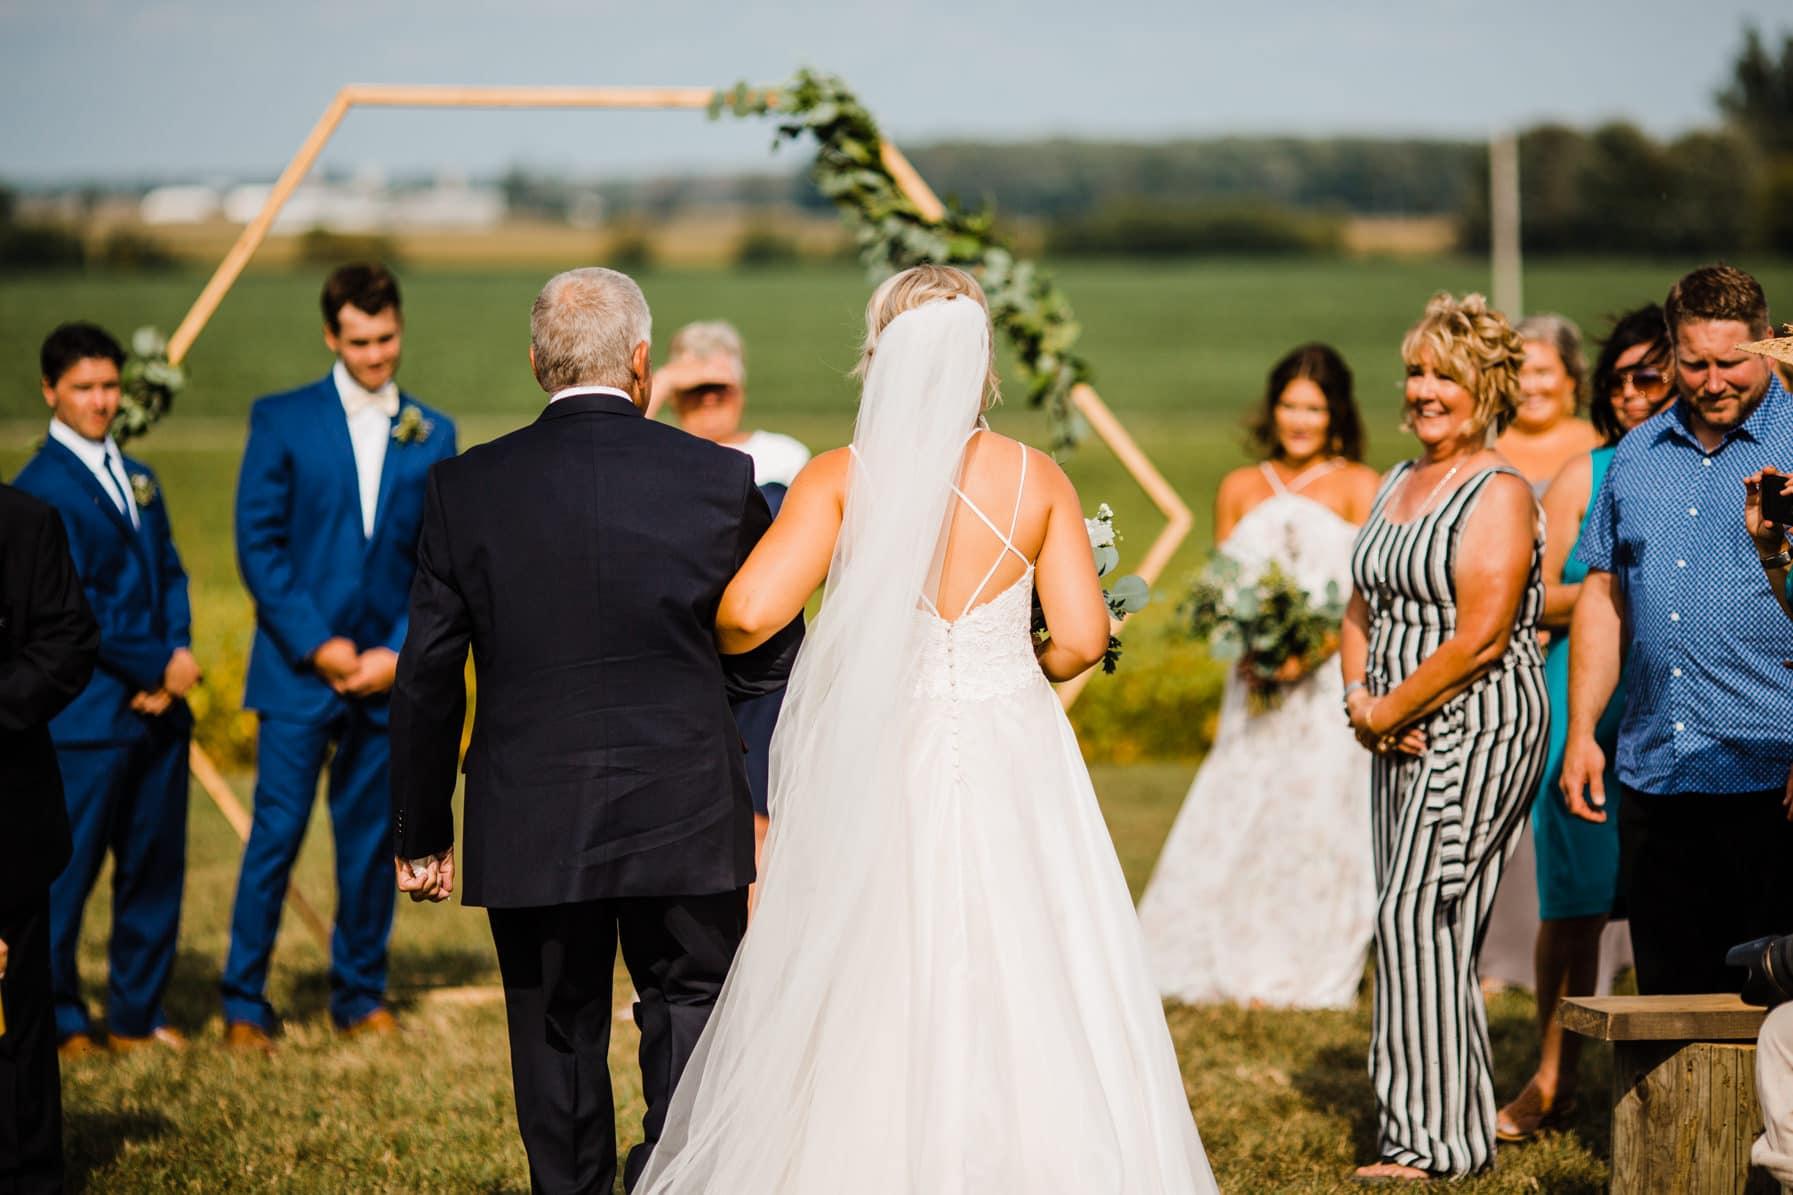 bride walks down the aisle - summer farm wedding